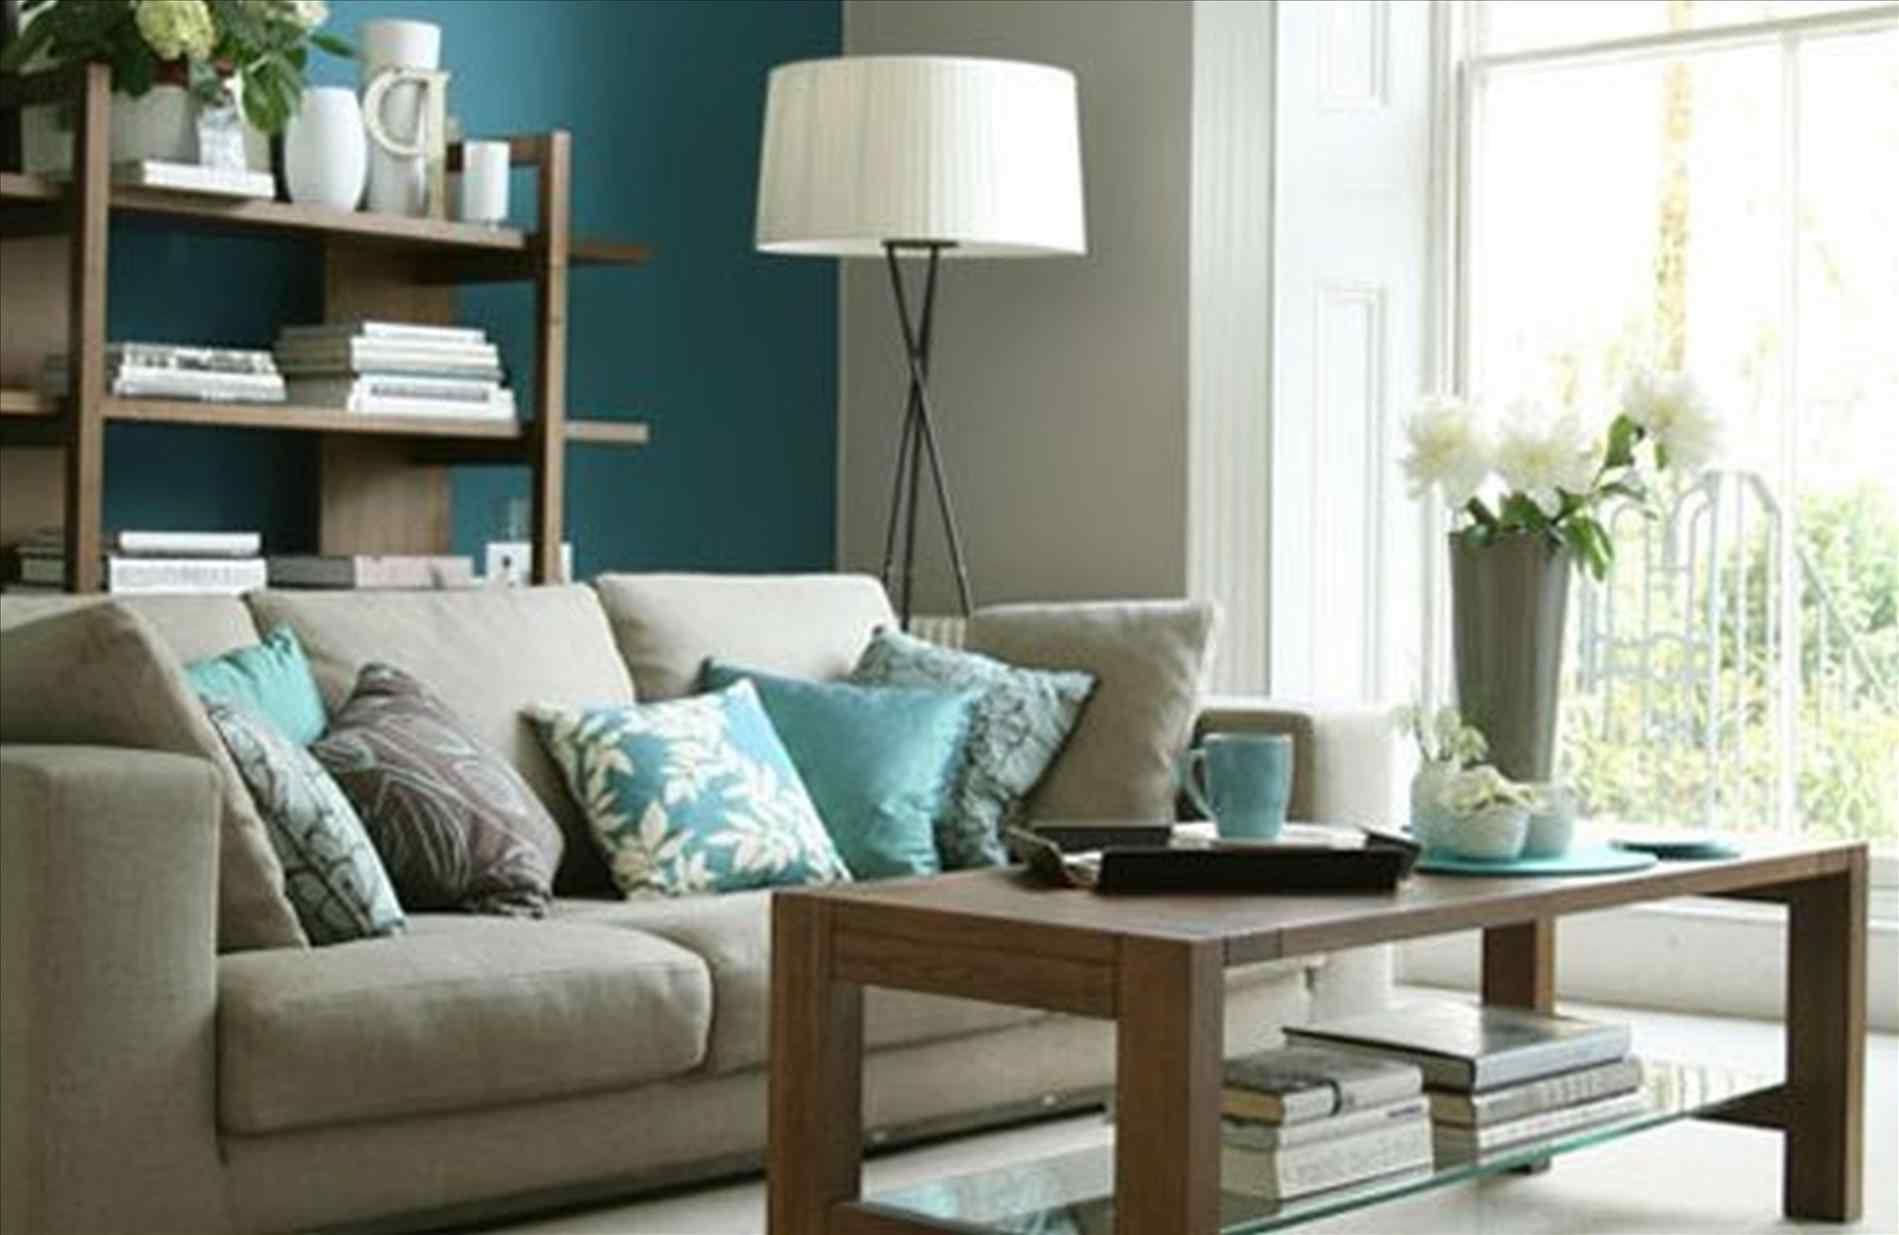 Pleasant Rugs To Match Grey Couch Rugs Online Inzonedesignstudio Interior Chair Design Inzonedesignstudiocom